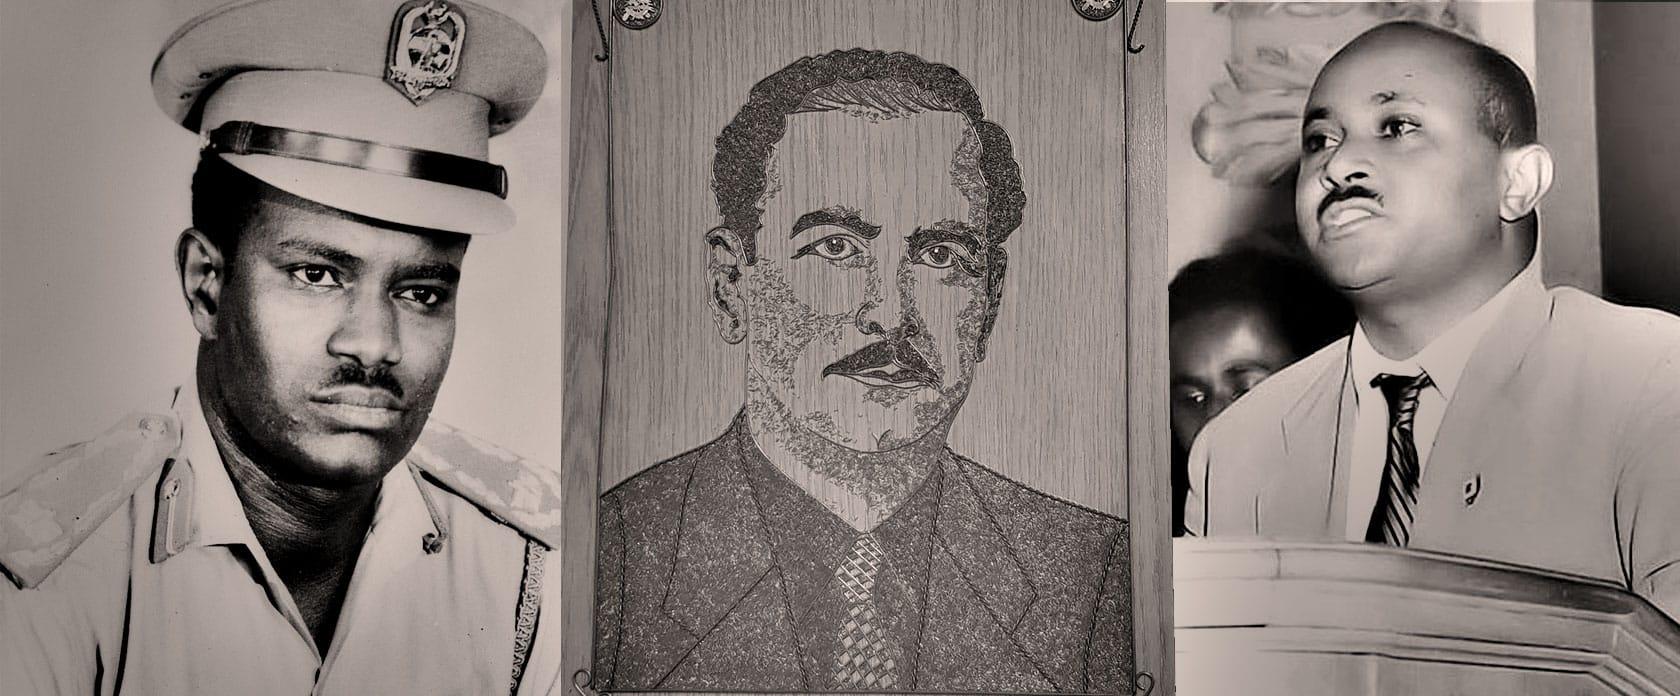 Hussein,révolutionnaire Et Martyr - cover